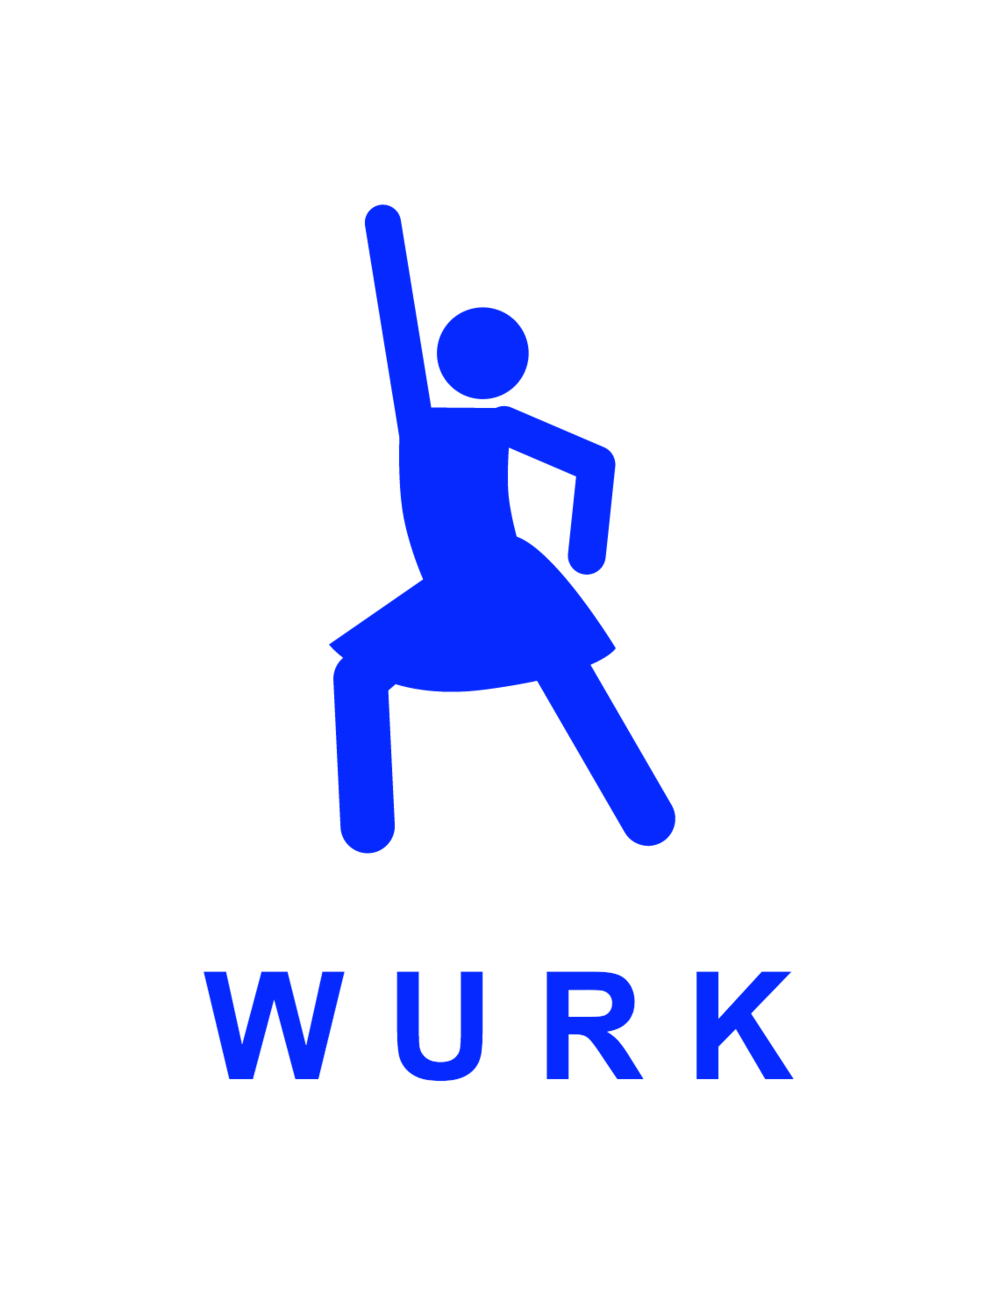 W U R K-logomark (1).png